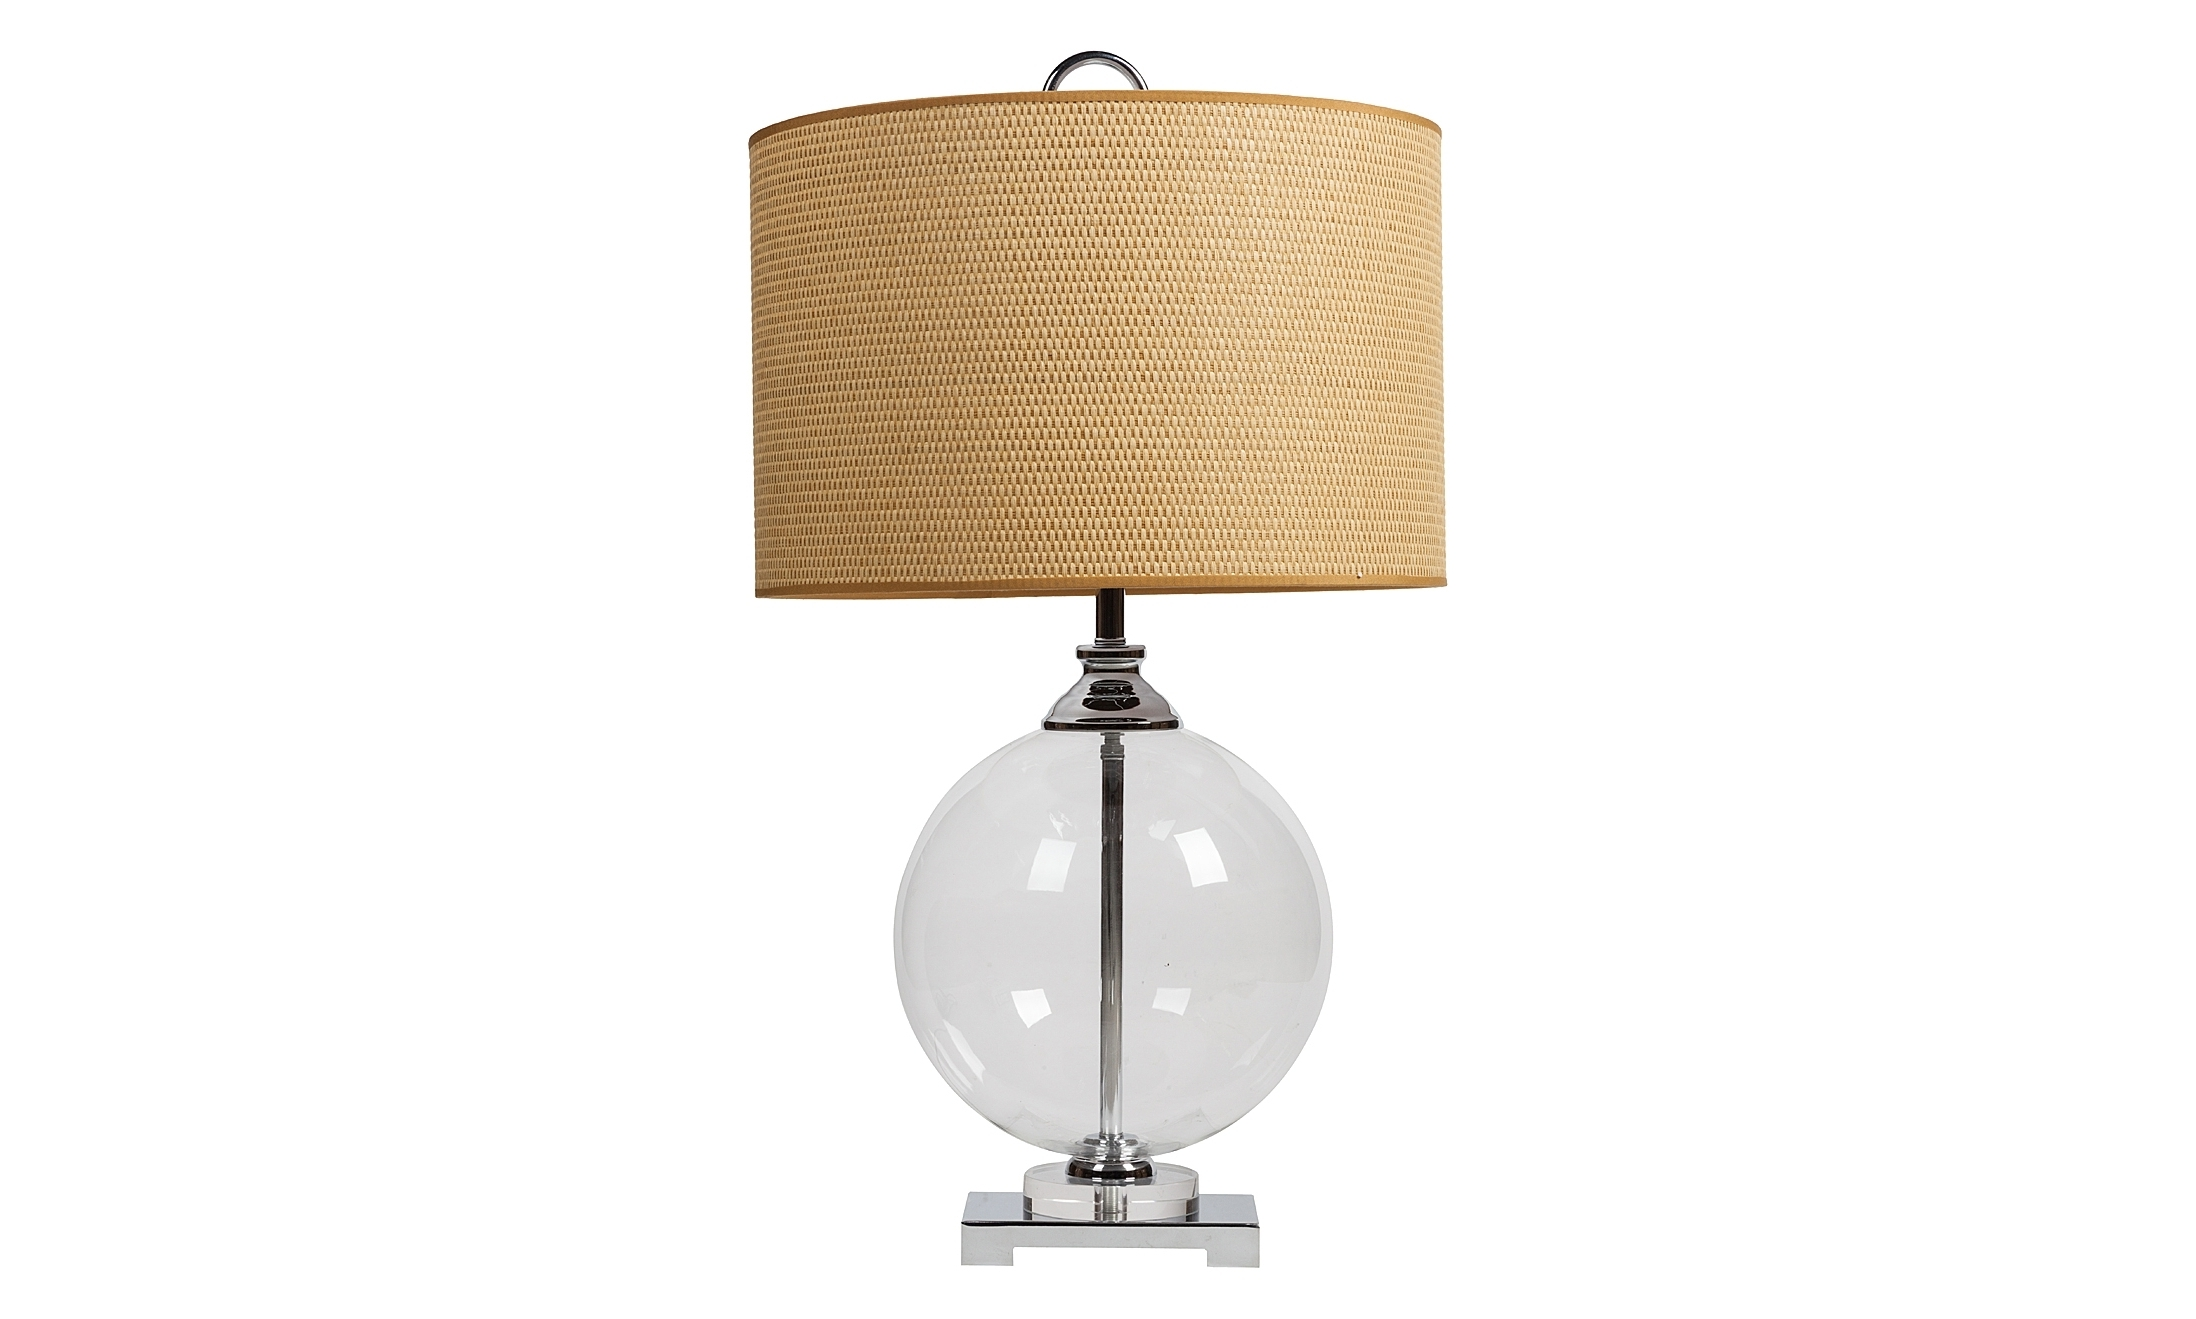 Настольная лампа Catalan UttermostДекоративные лампы<br>&amp;lt;div&amp;gt;Цоколь: E27&amp;lt;/div&amp;gt;&amp;lt;div&amp;gt;Мощность ламп: 60W&amp;lt;/div&amp;gt;&amp;lt;div&amp;gt;Количество лампочек: 1&amp;lt;/div&amp;gt;&amp;lt;div&amp;gt;Максимальная площадь освещения: 4&amp;lt;/div&amp;gt;&amp;lt;div&amp;gt;Материал: Металл, Стекло, Ткань&amp;lt;/div&amp;gt;<br><br>Material: Металл<br>Height см: 68<br>Diameter см: 38